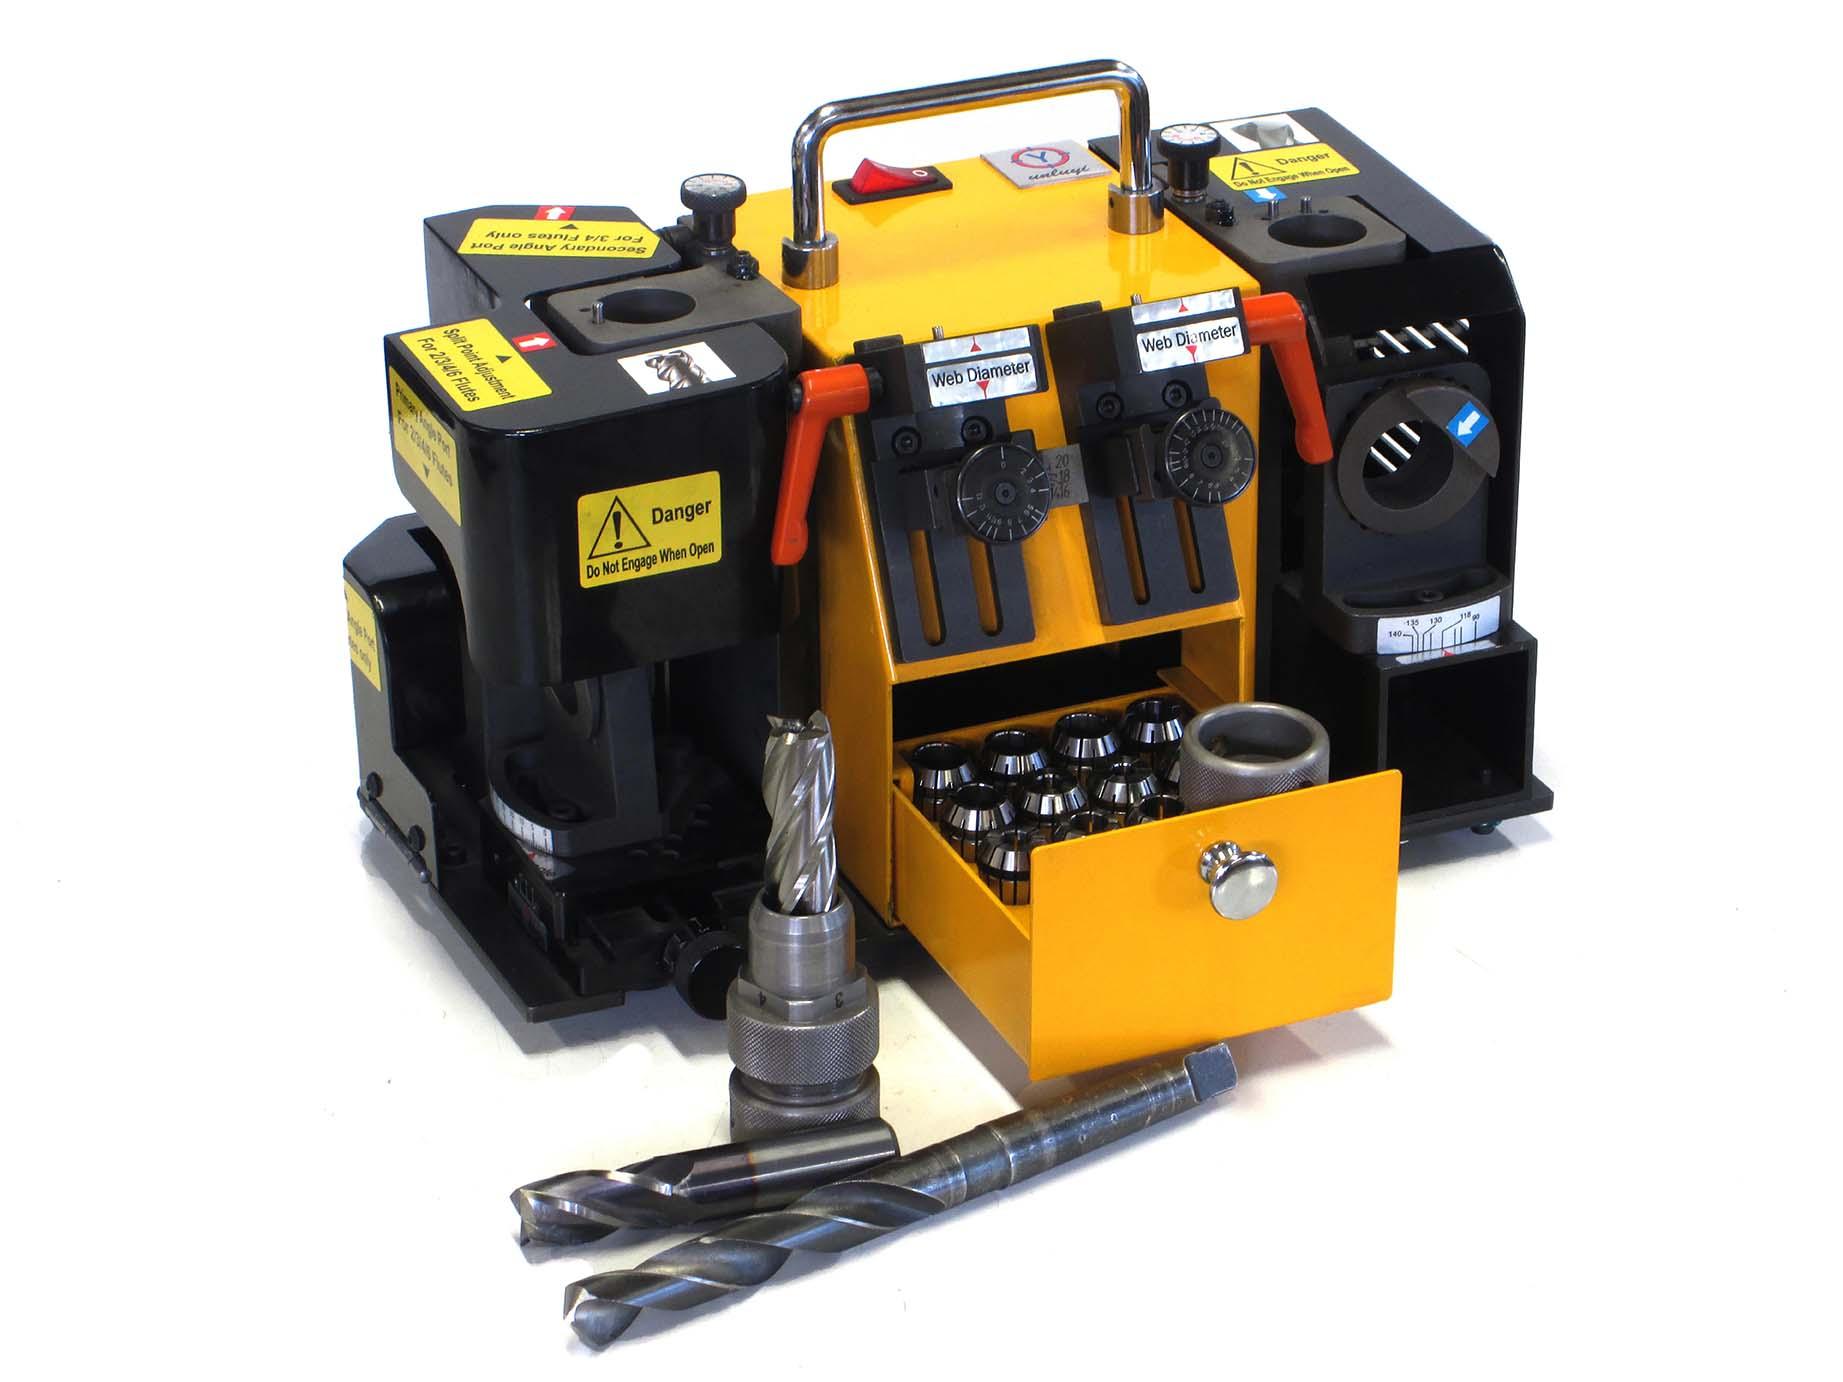 Tabletop tool sharpeners  Cutting Tool Engineering